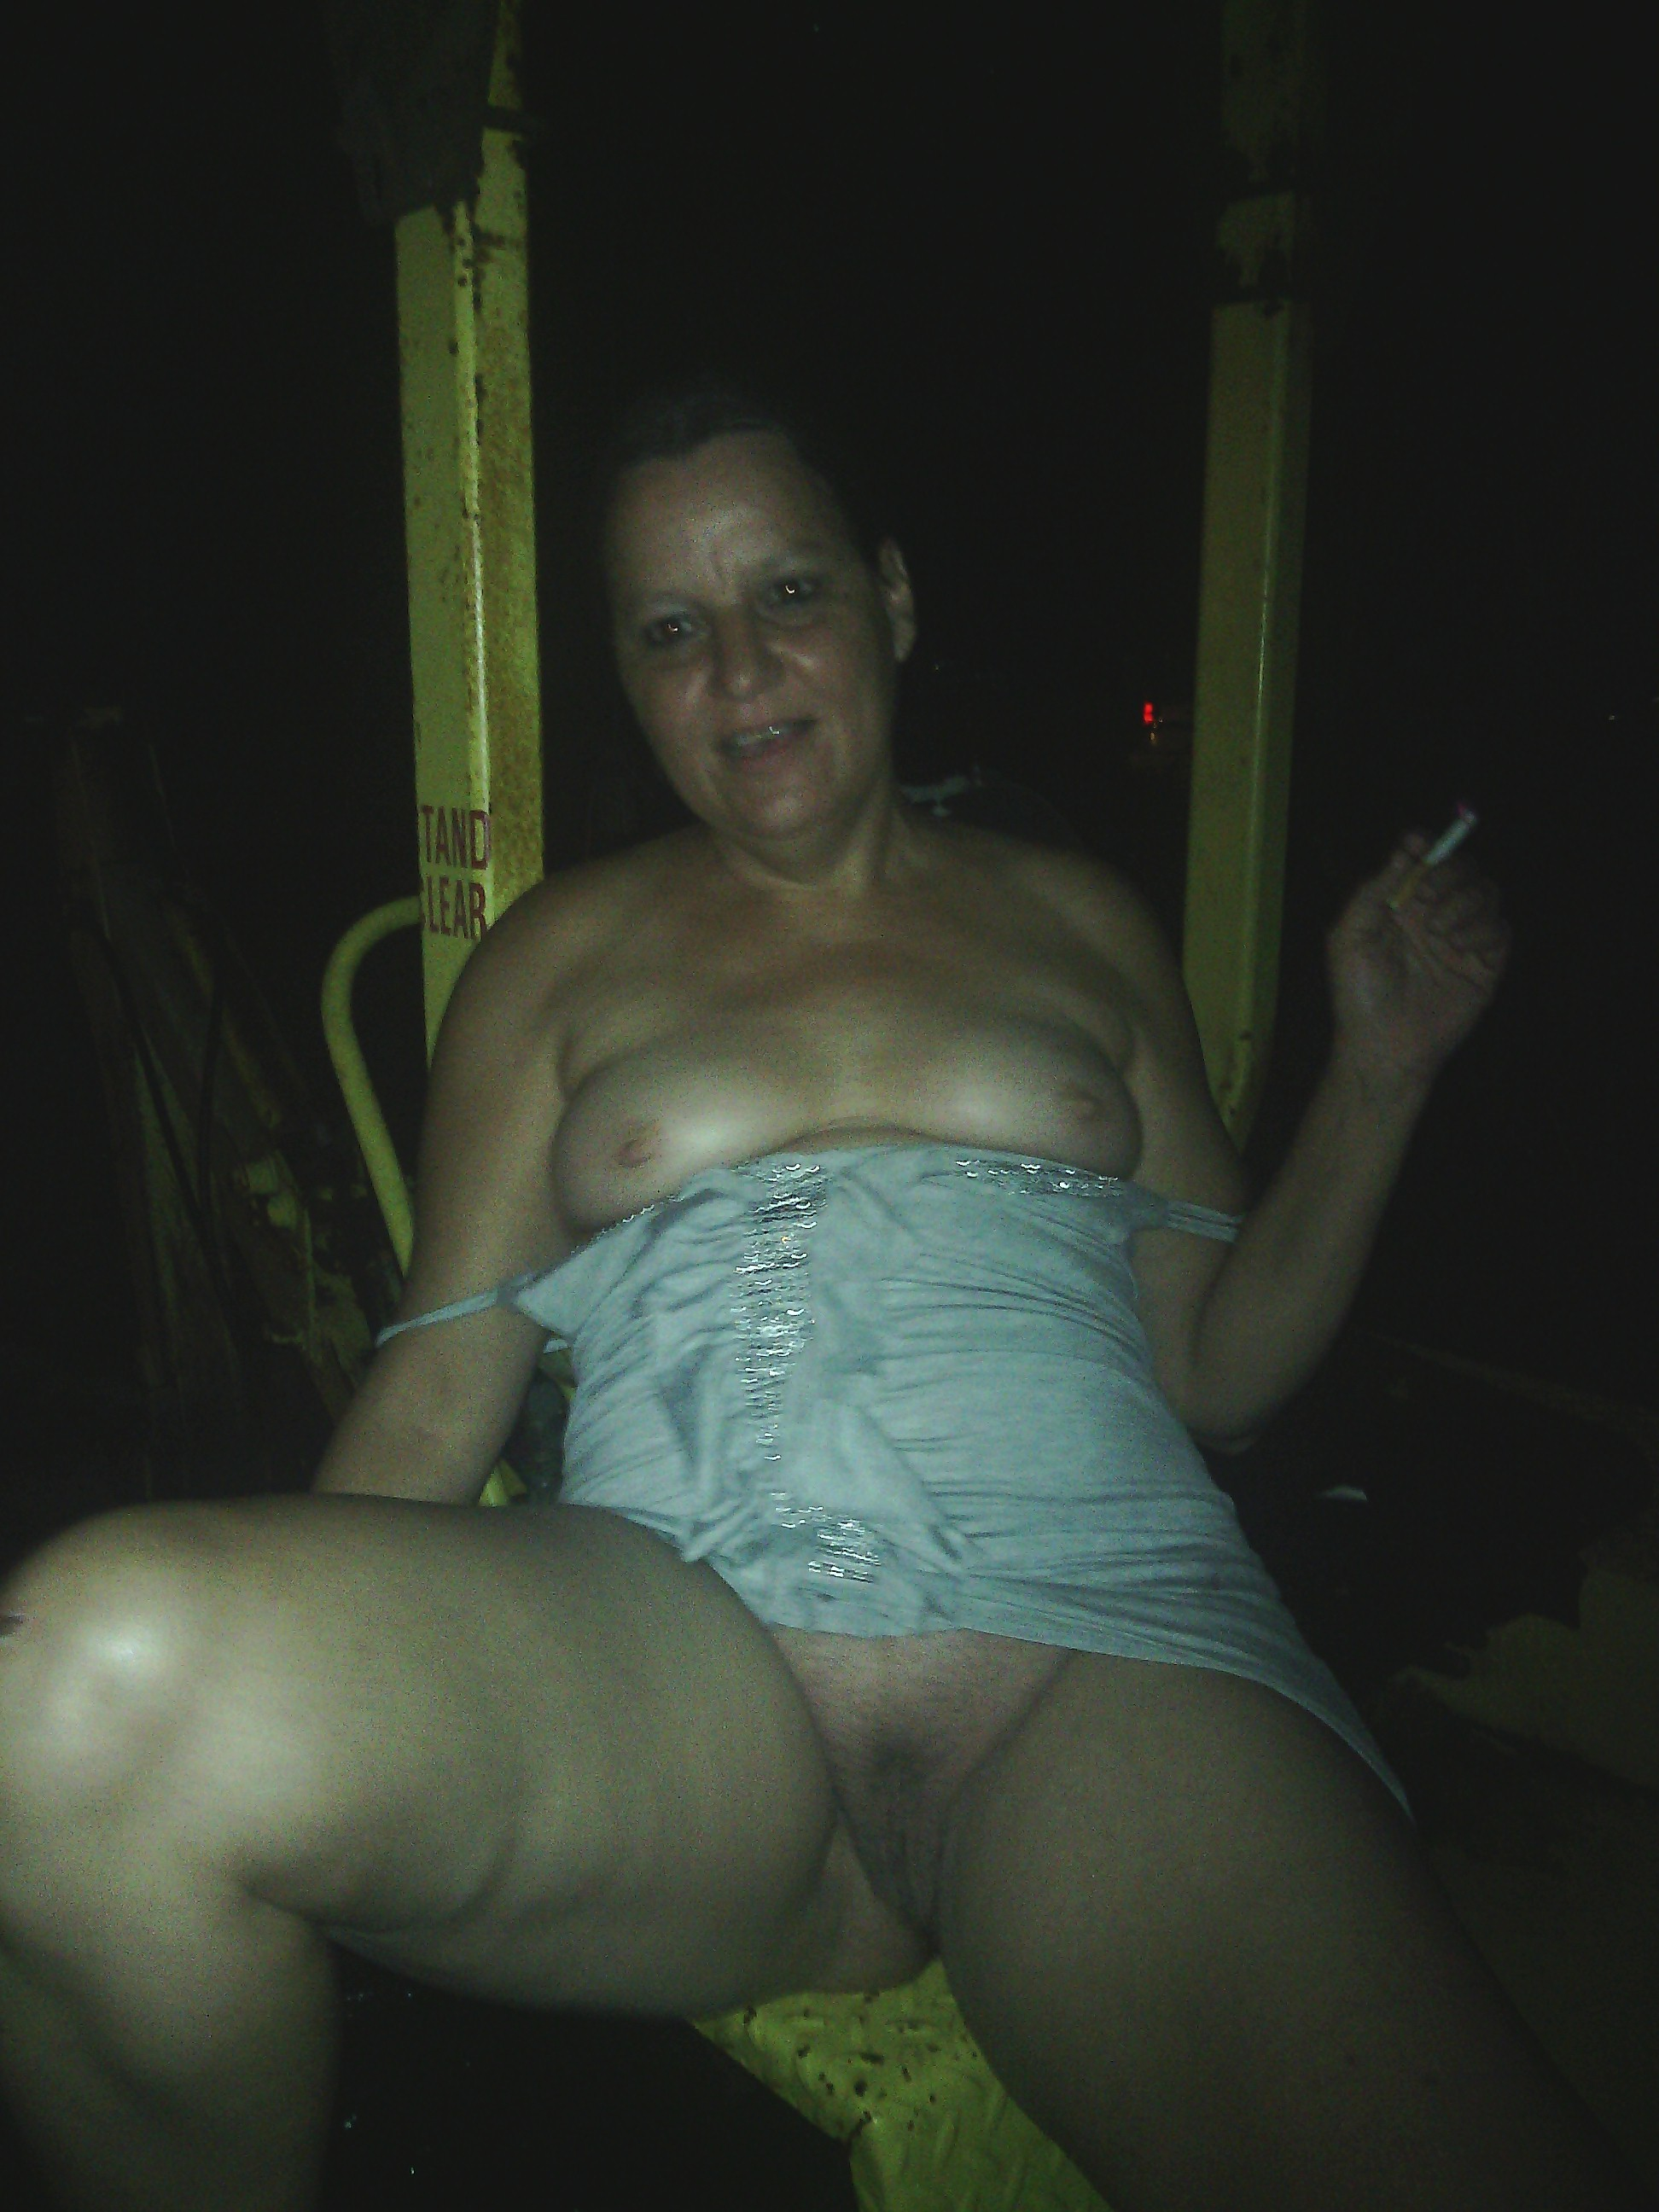 lucy bill having sex in eastender